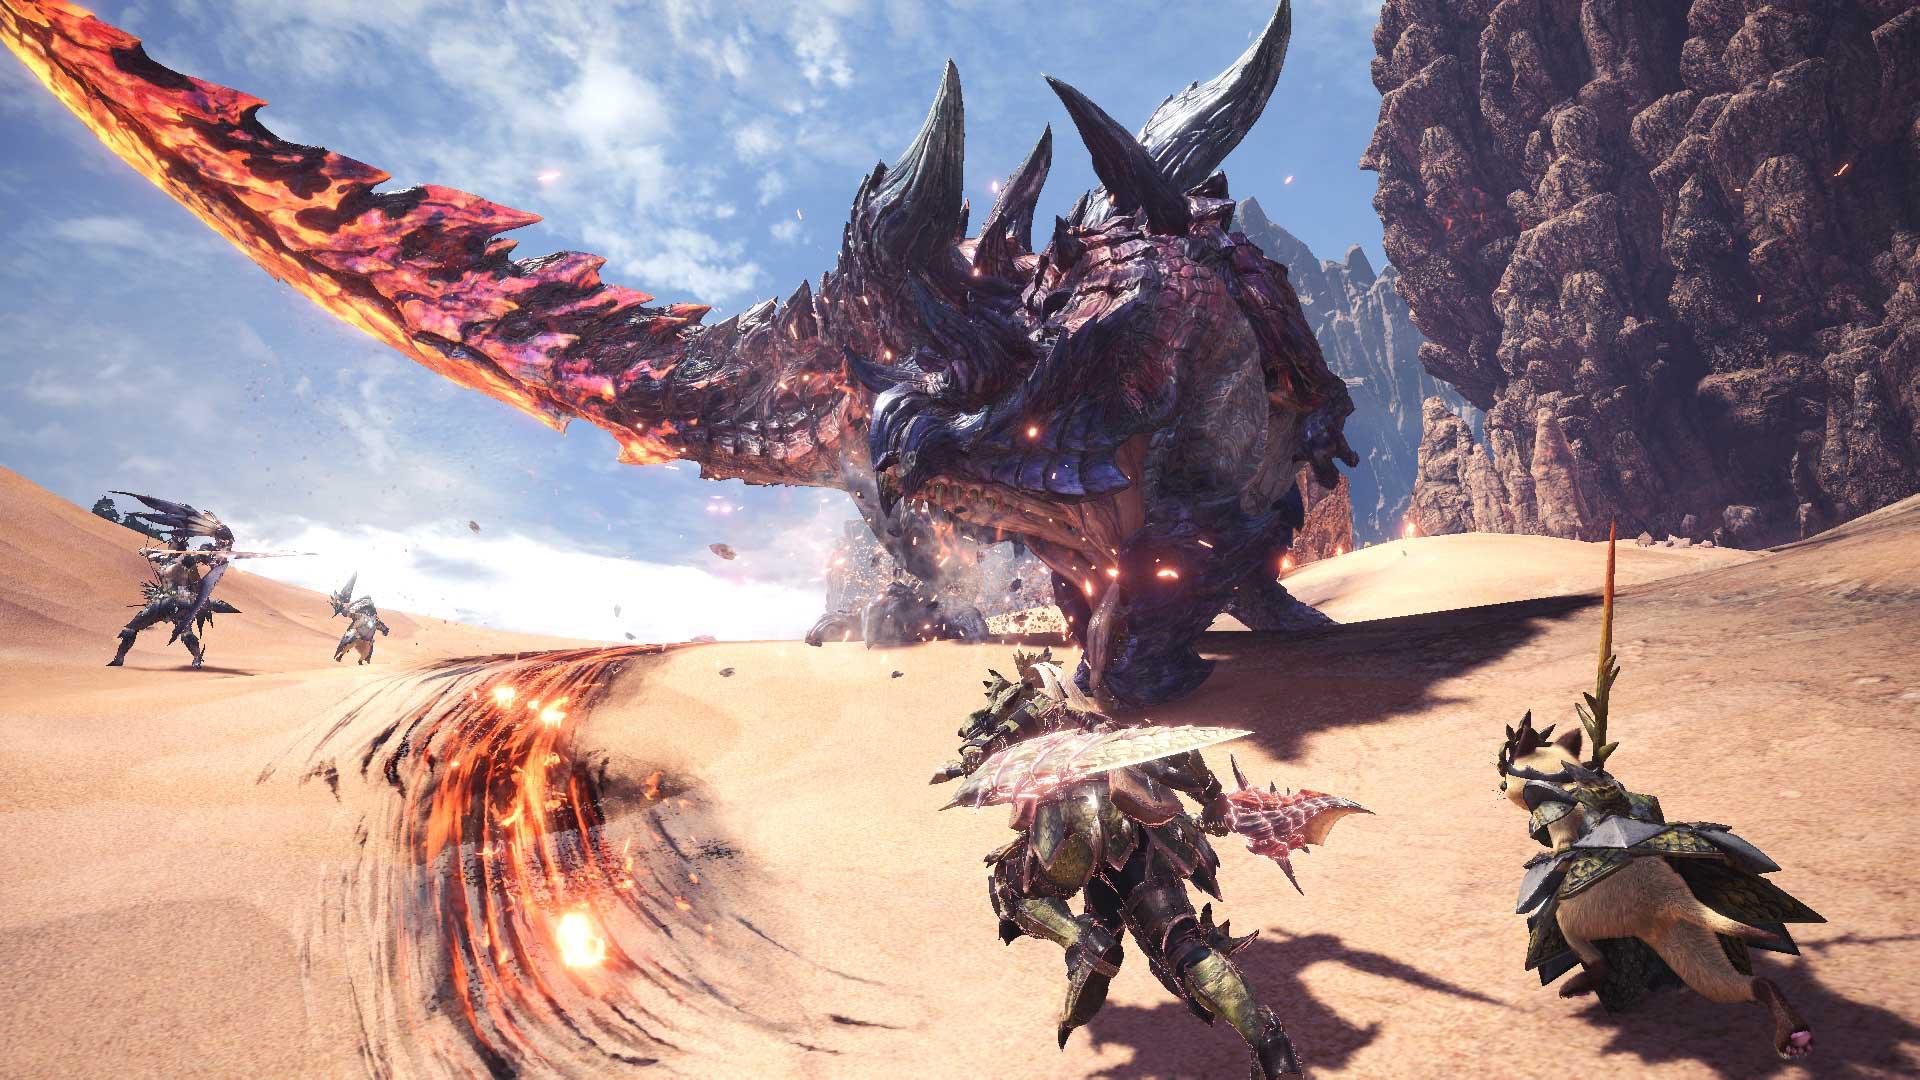 Monster Hunter World: Iceborne - New Glavenus Gameplay, Pre-Order Armor